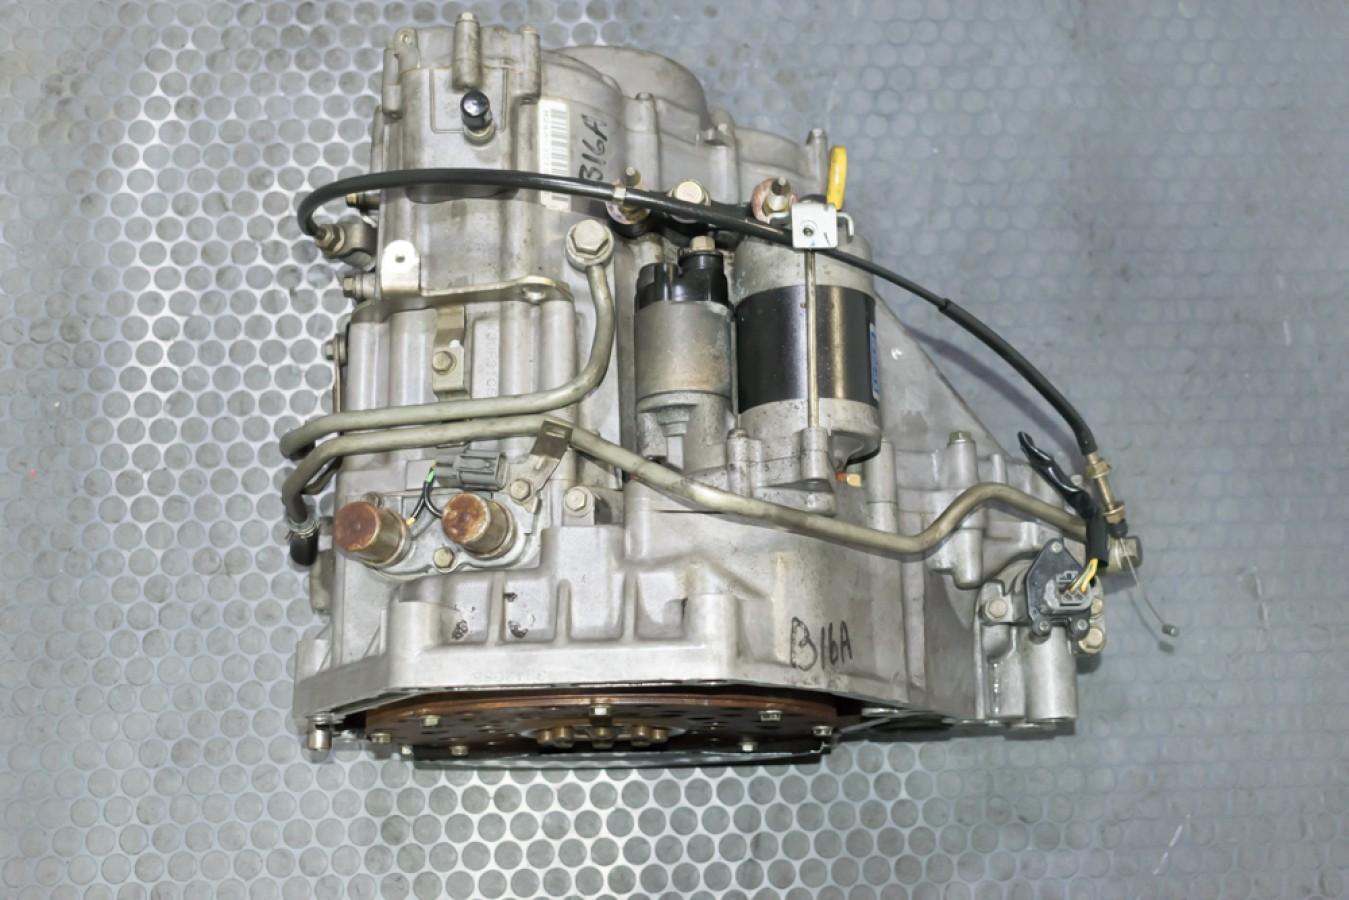 Low Mileage Used Jdm Honda Del Sol Integra M24a Manual Guide